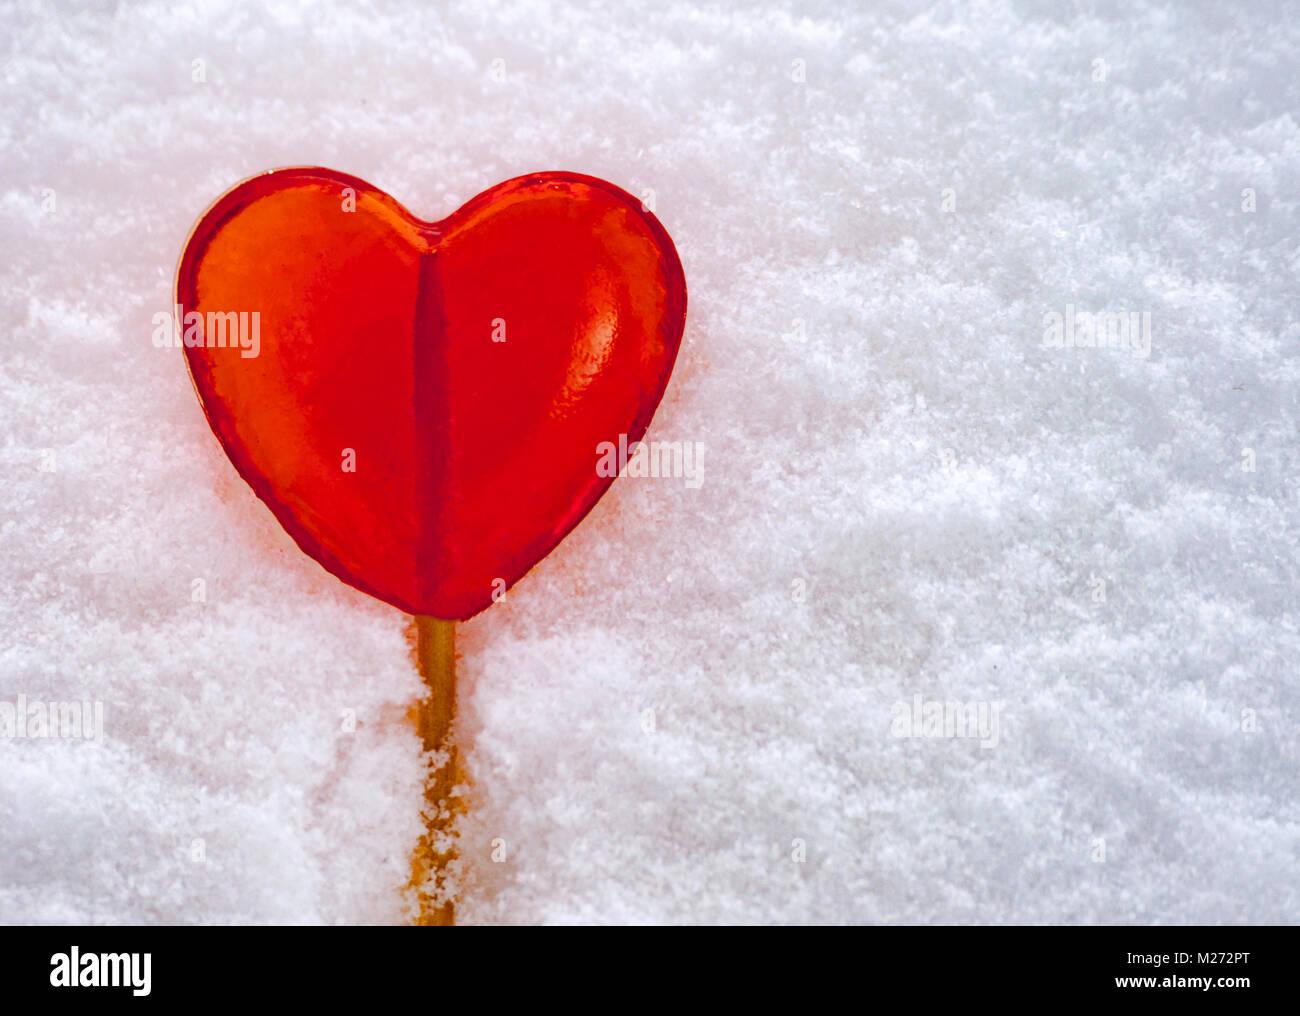 Heart Shape In Snow Stockfotos & Heart Shape In Snow Bilder - Seite ...